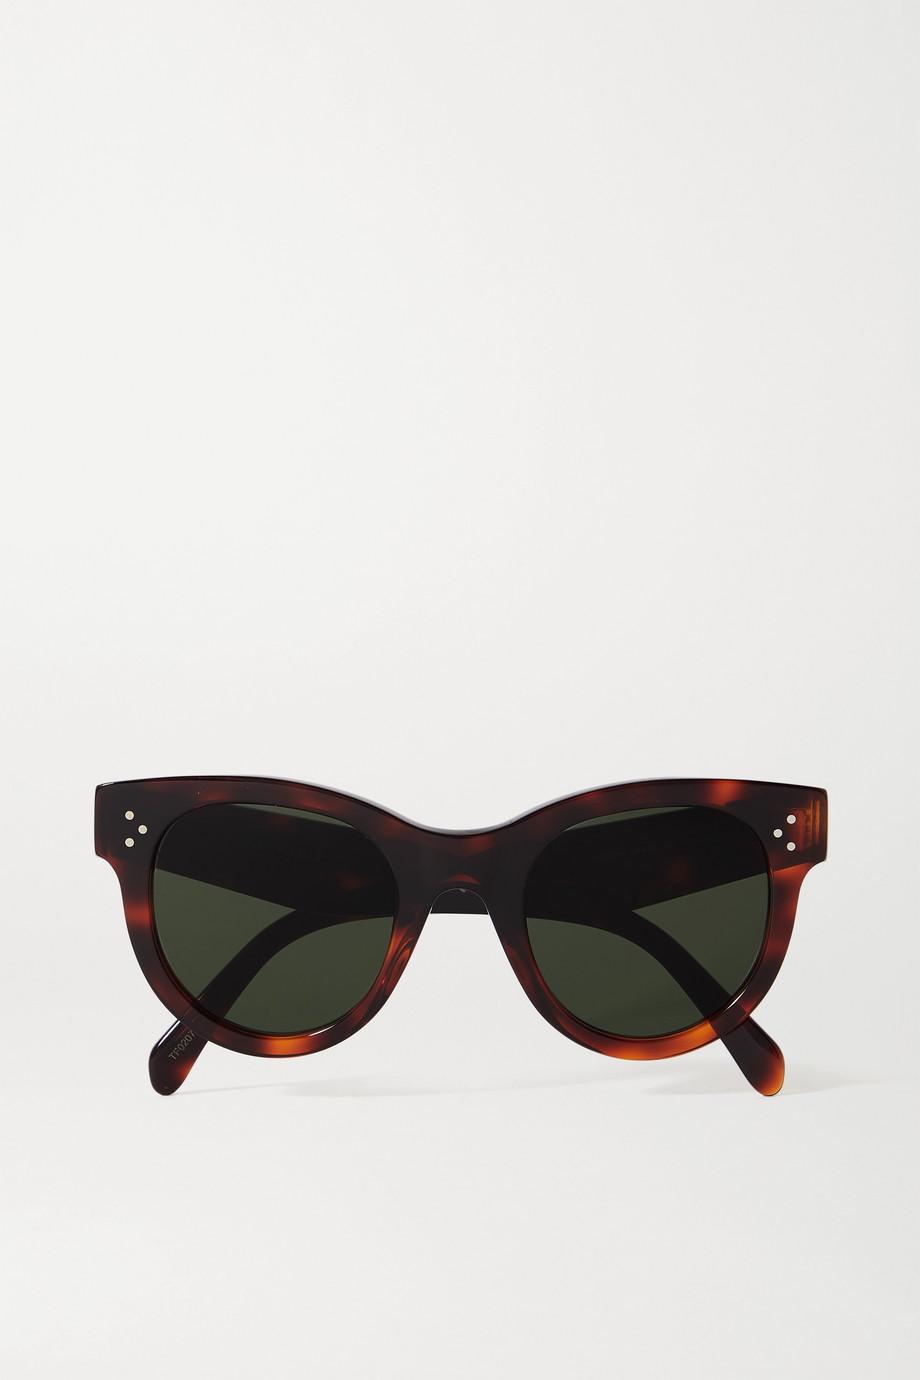 Celine Sonnenbrille mit rundem Rahmen aus Azetat in Hornoptik